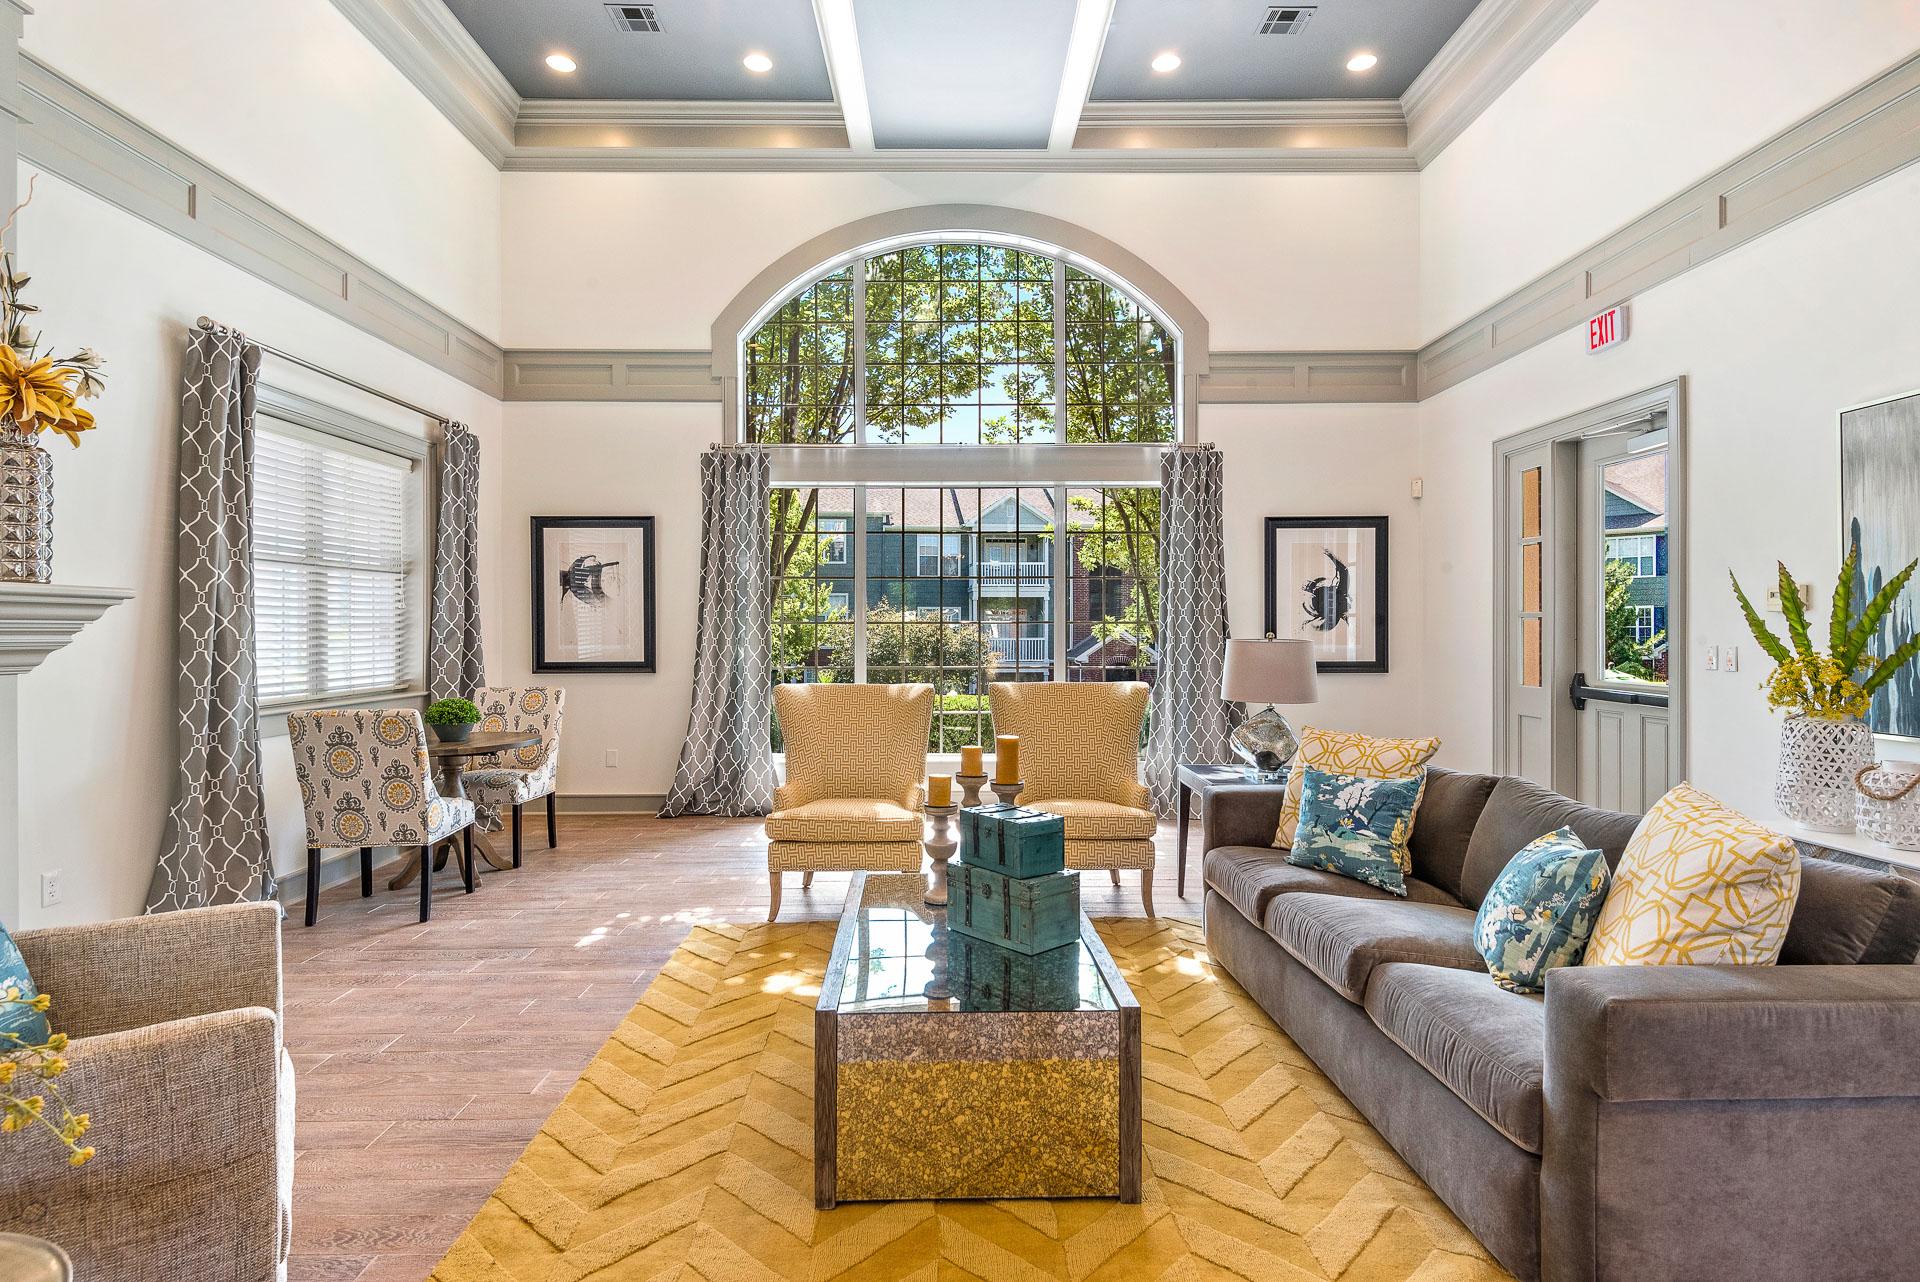 Sherpa Media Kansas City - Apartments & Multi-Family Housing - 03